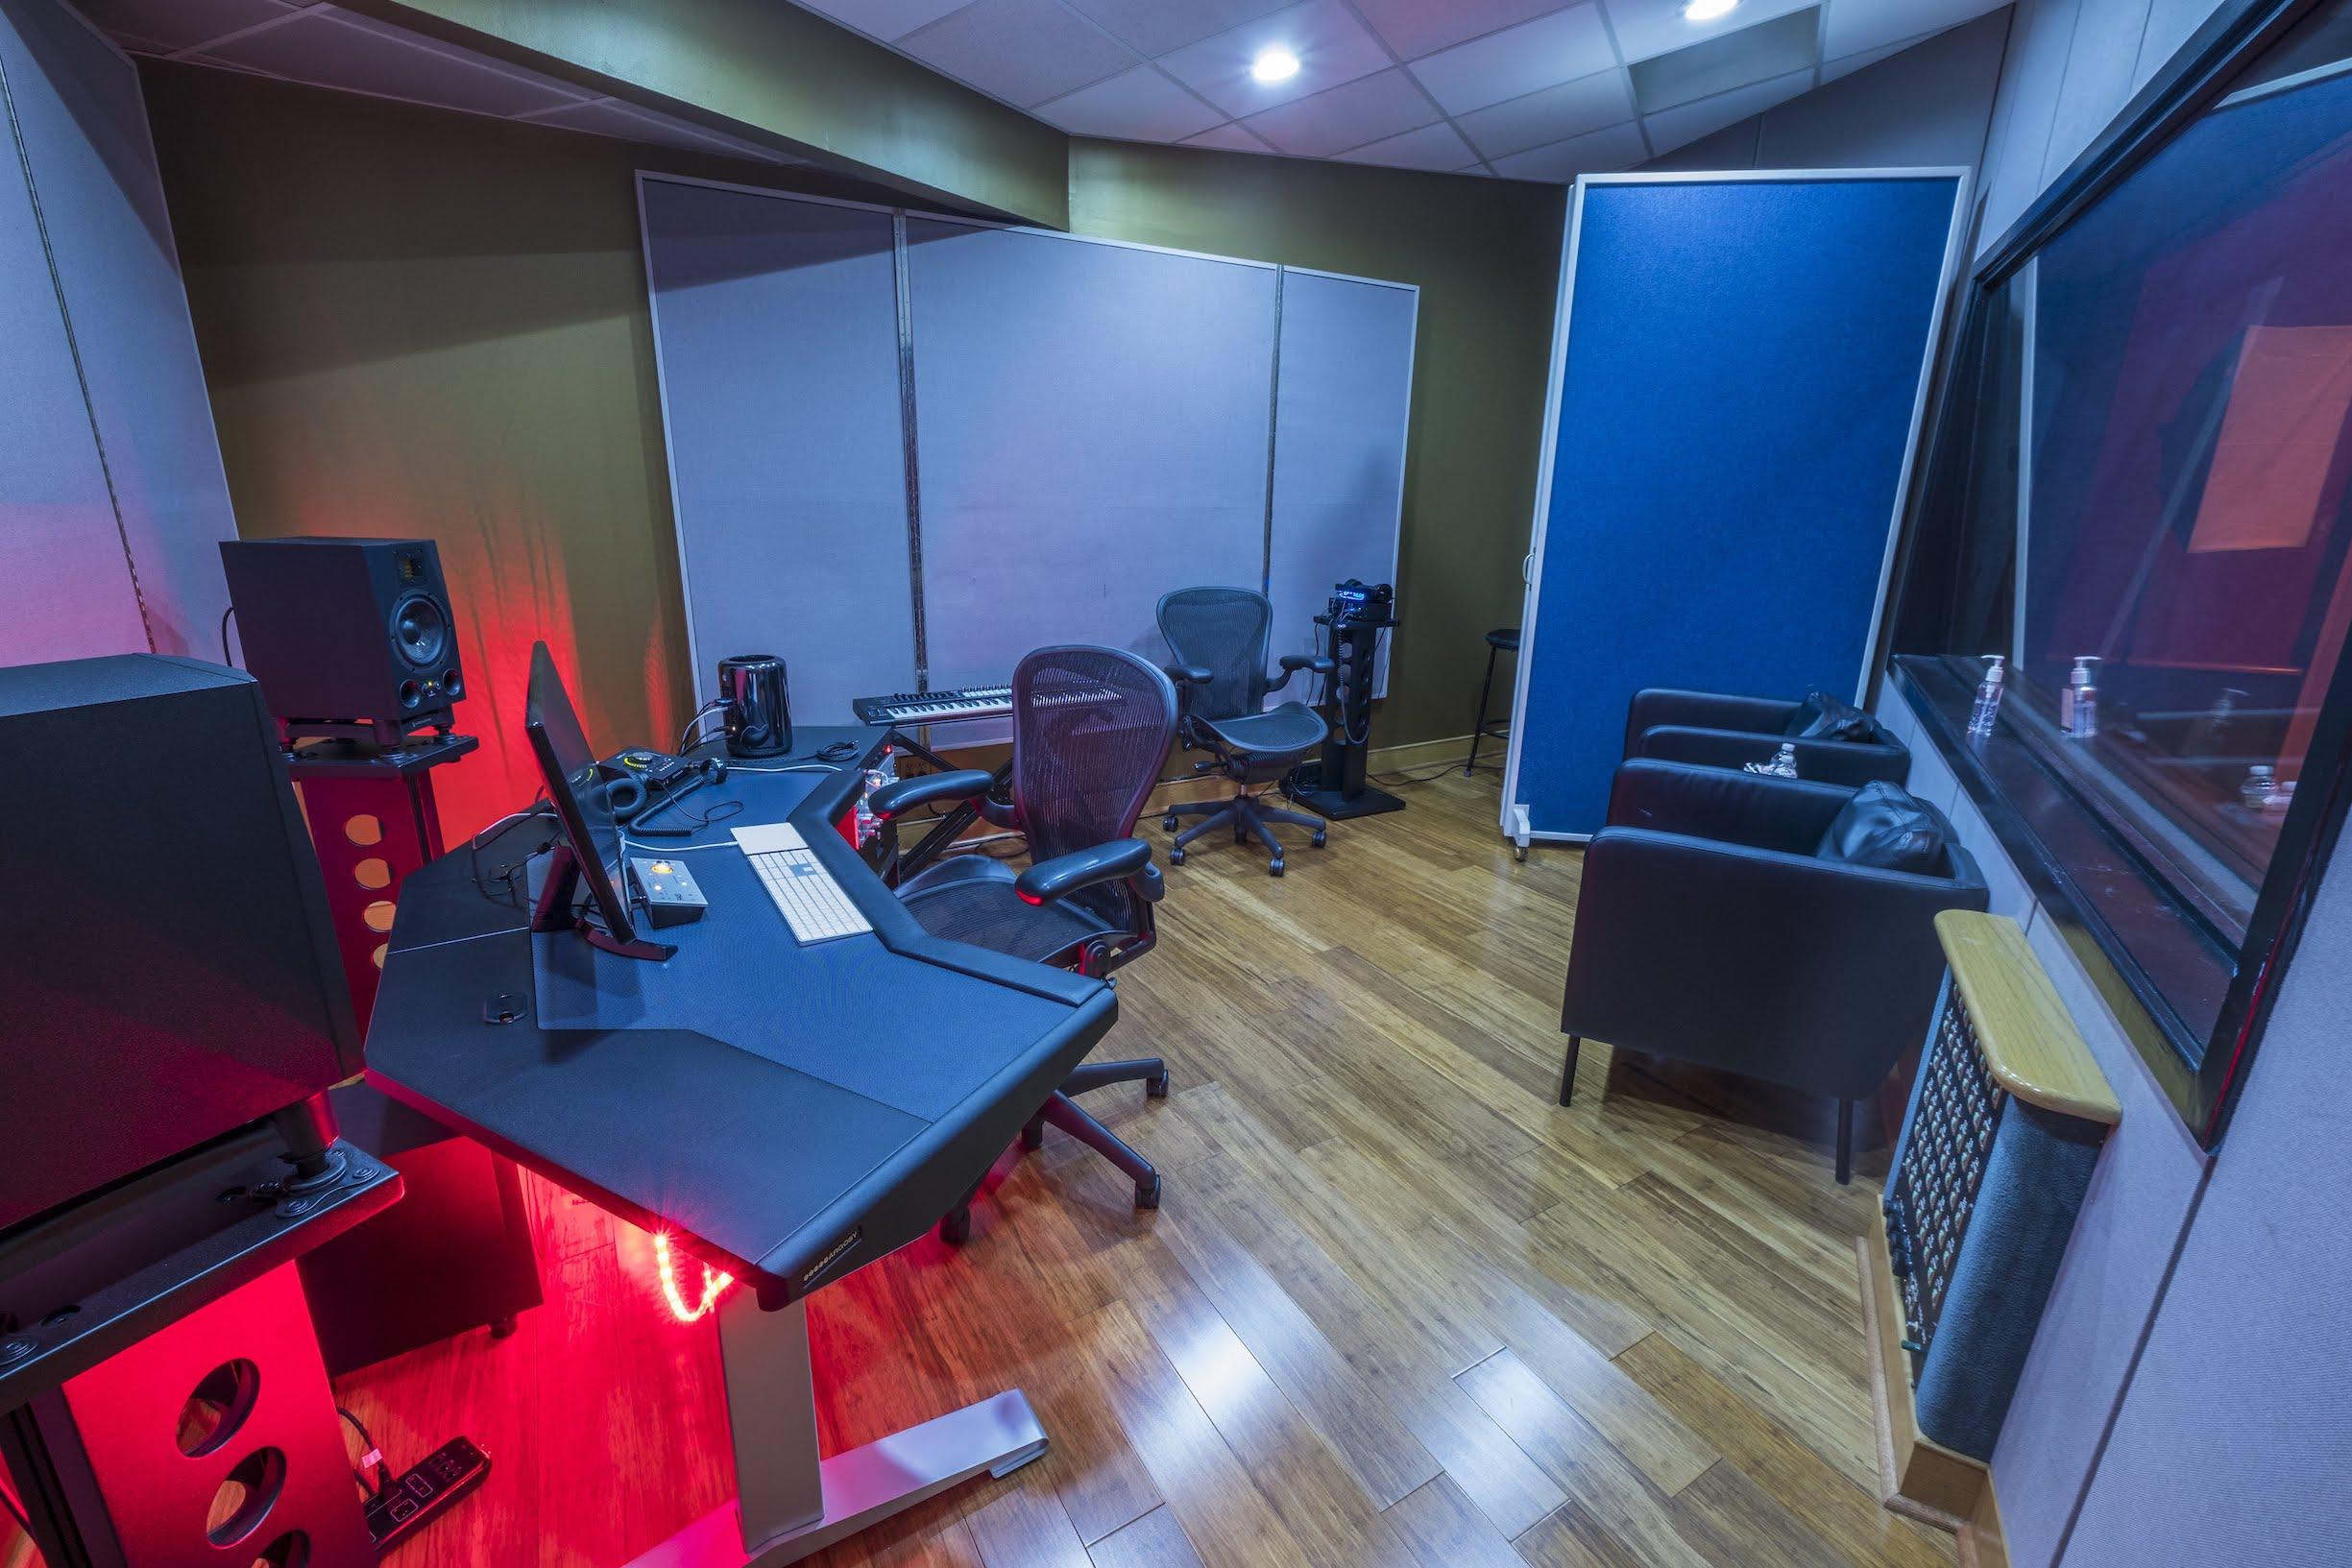 Gold Room Recording Studio